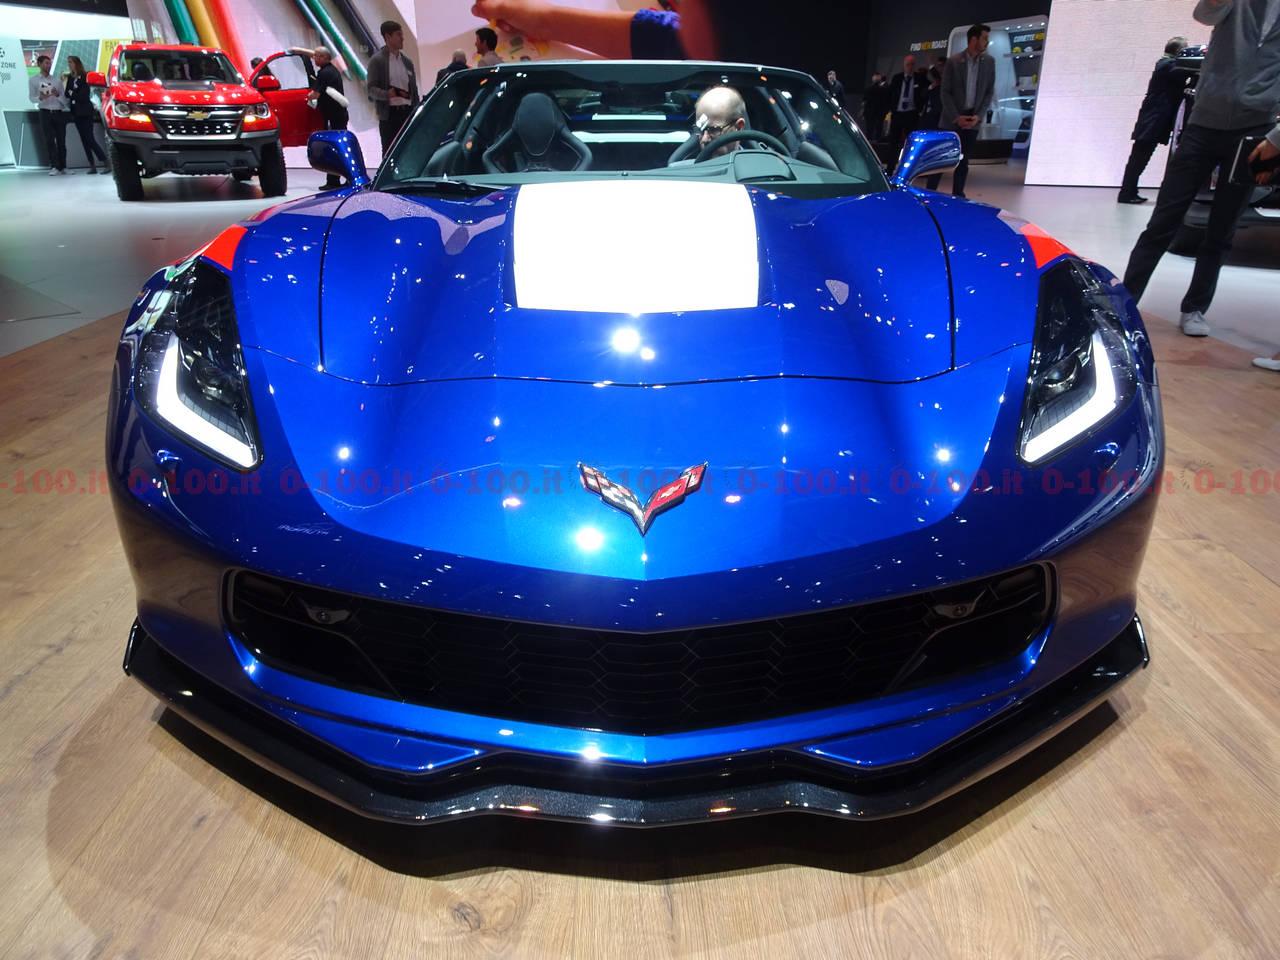 Ginevra-geneva-geneve-2017-Chevrolet-corvette-0-100_14